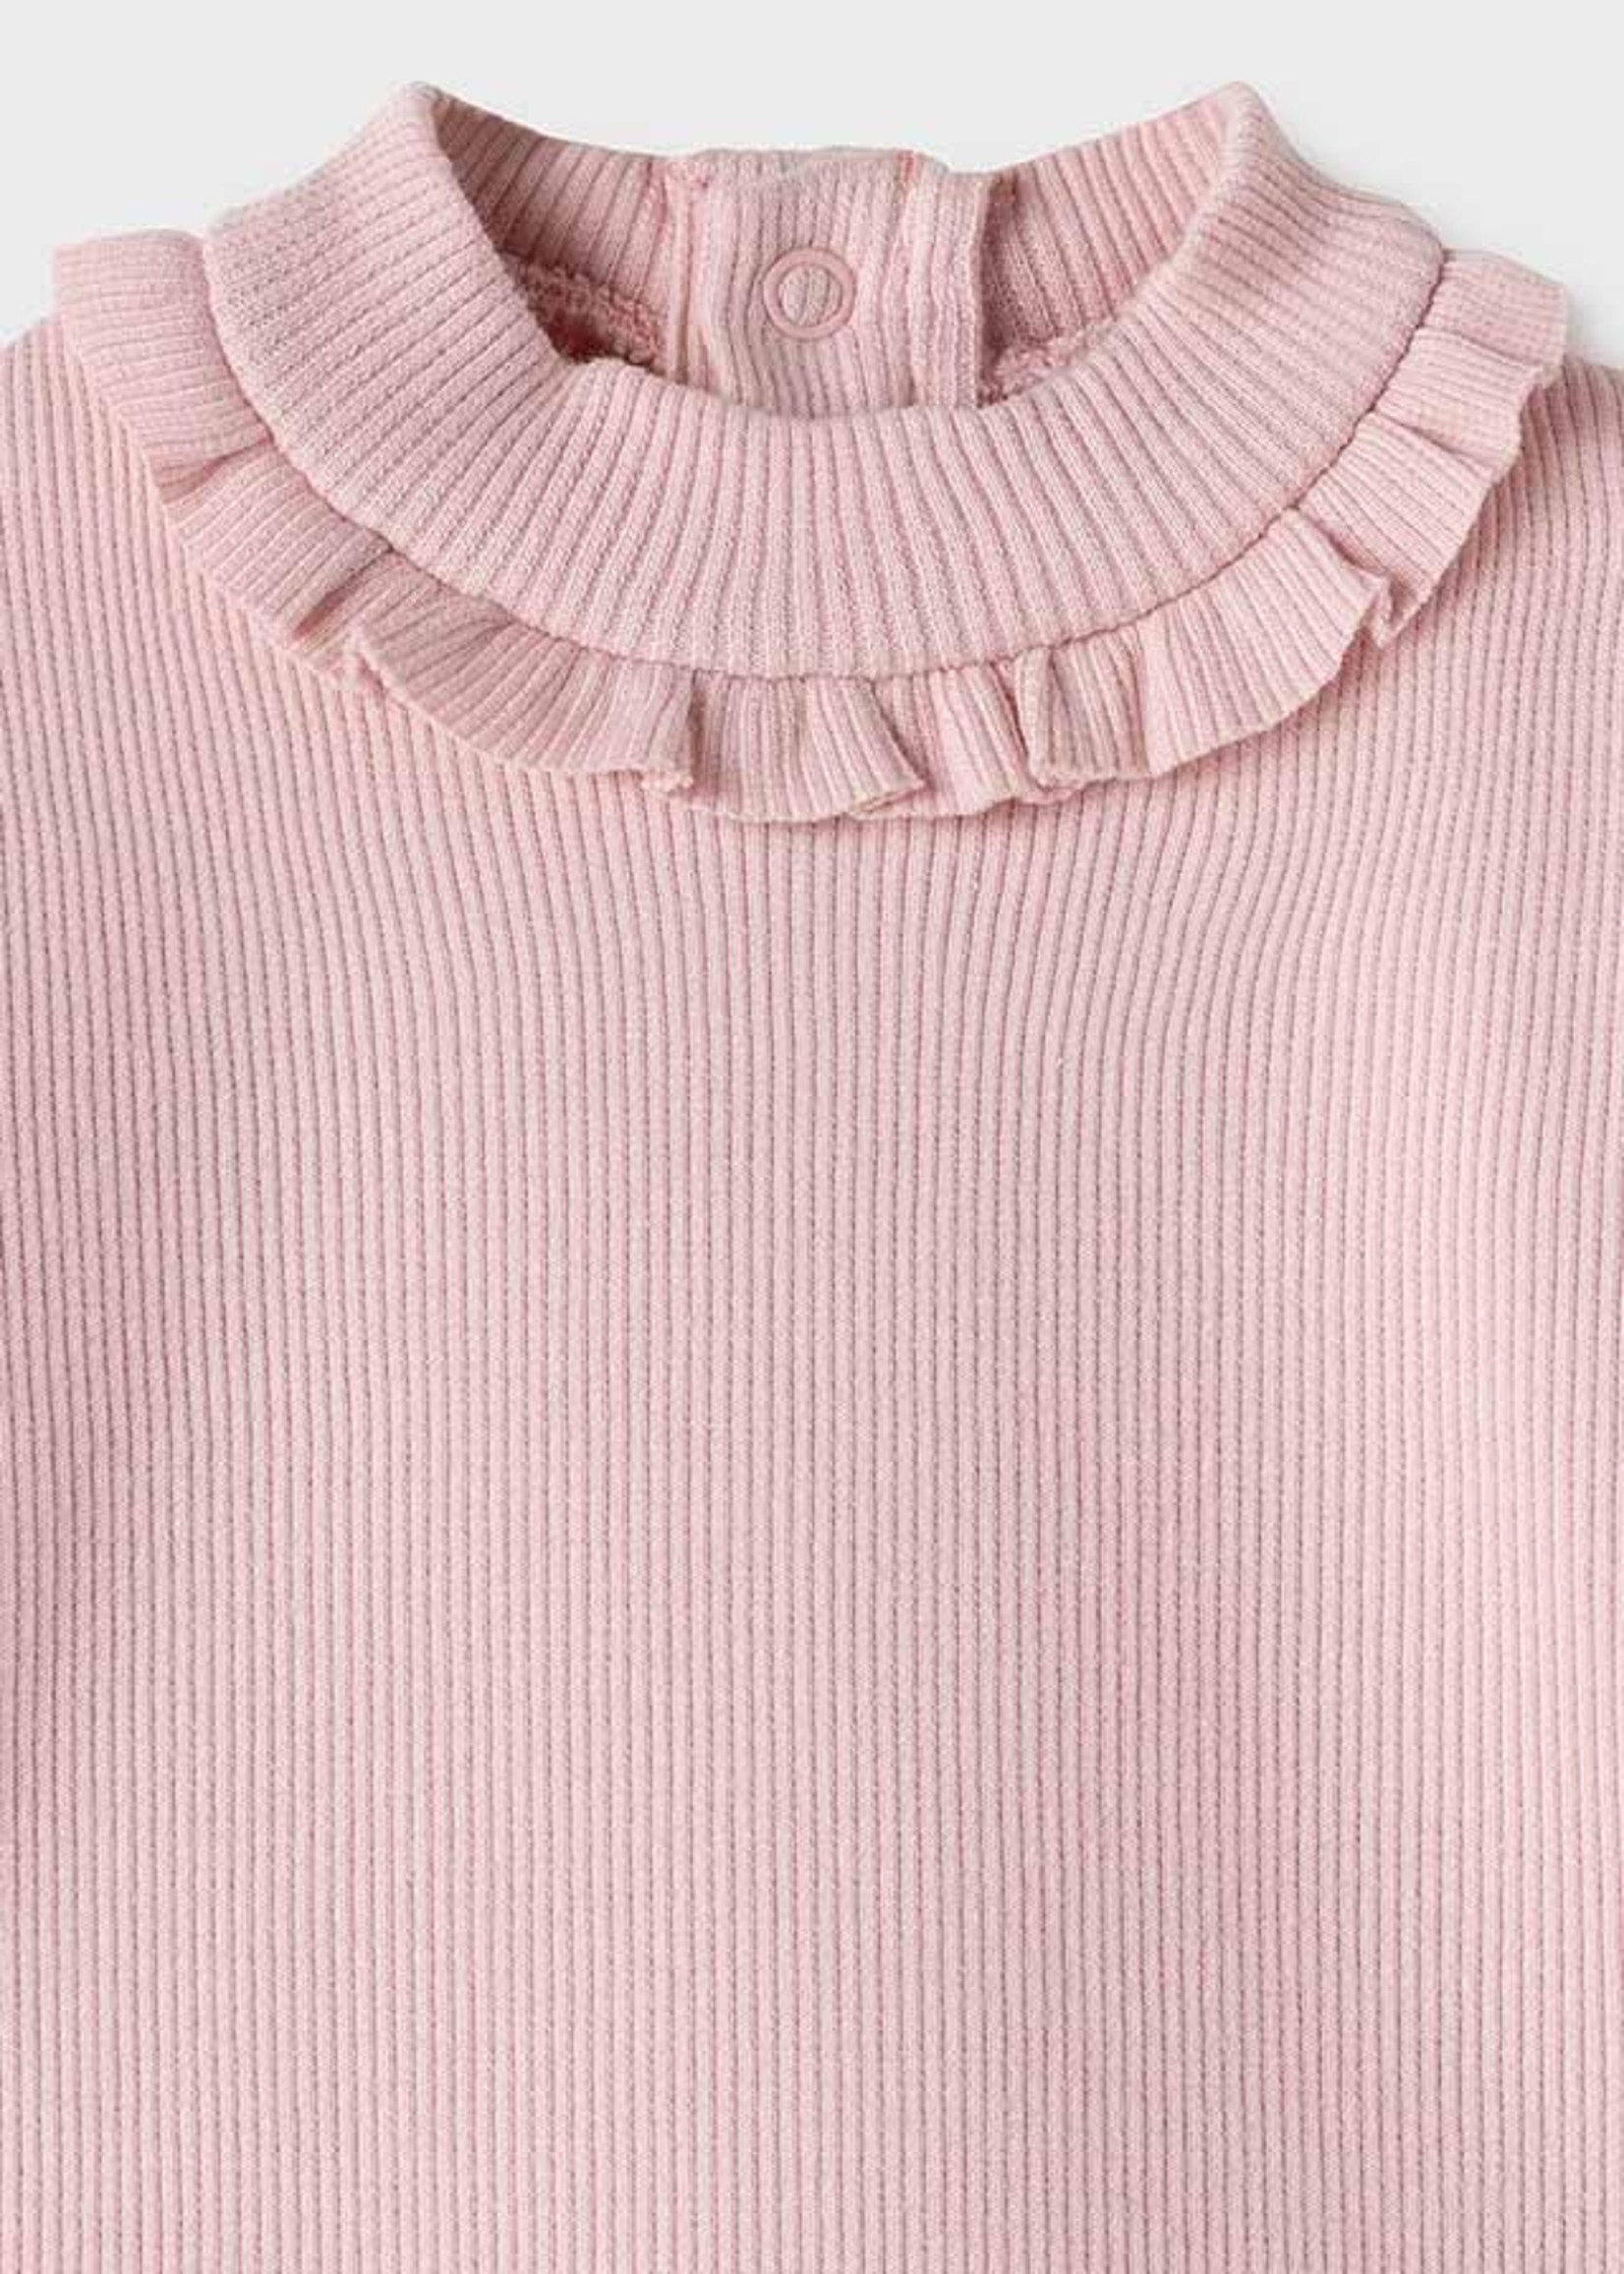 MAYORAL MAYORAL Sweater rib mockneck roze